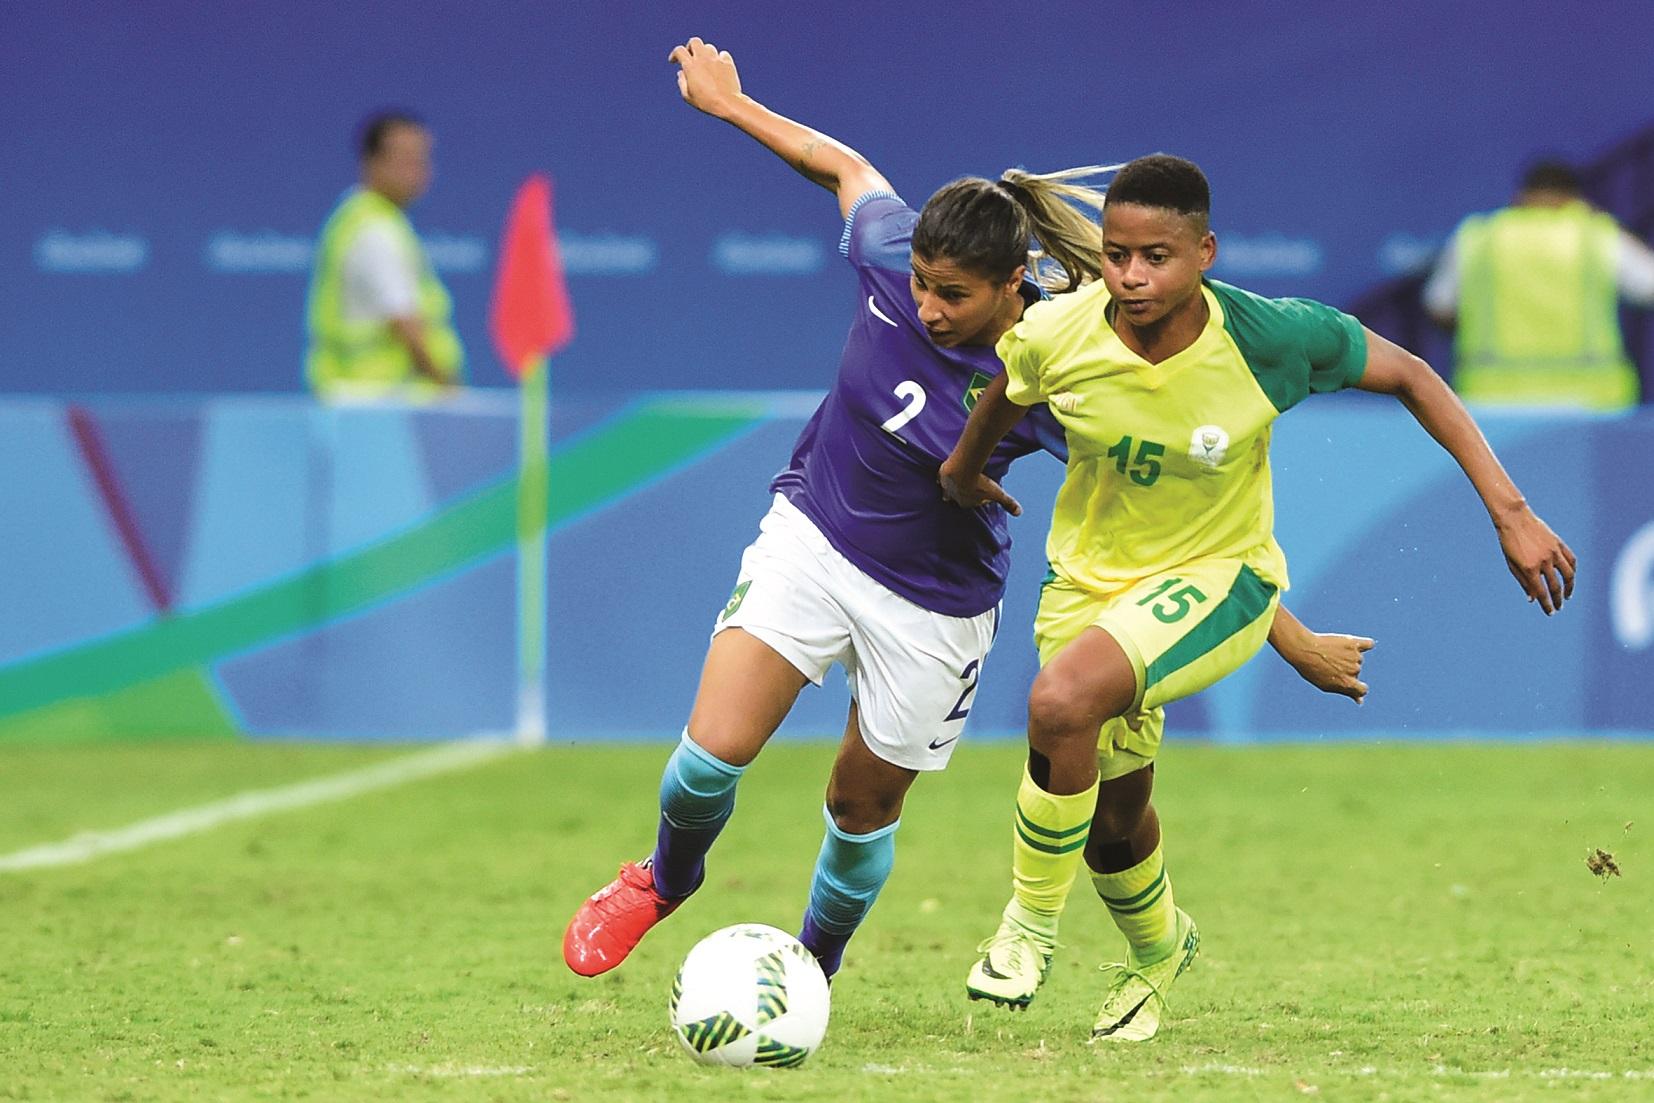 South Africa v Brazil: Women's Football – Olympics: Day 4